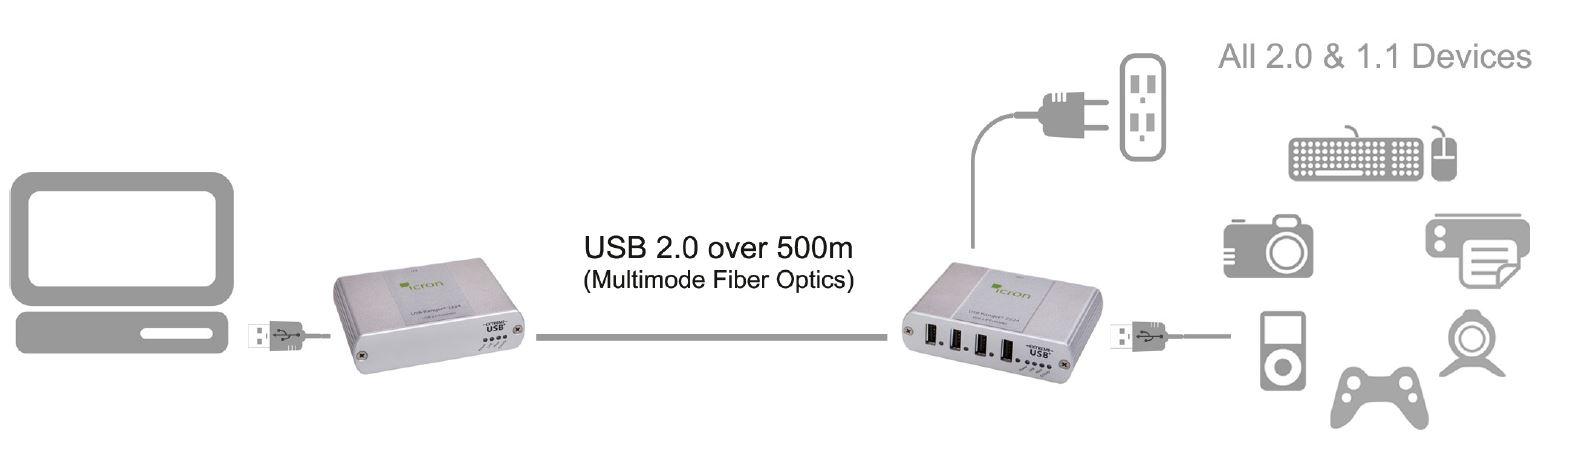 00-00261-icron-usb-ranger-2224-4-port-usb-extender-glasfaser-500m-diagramm